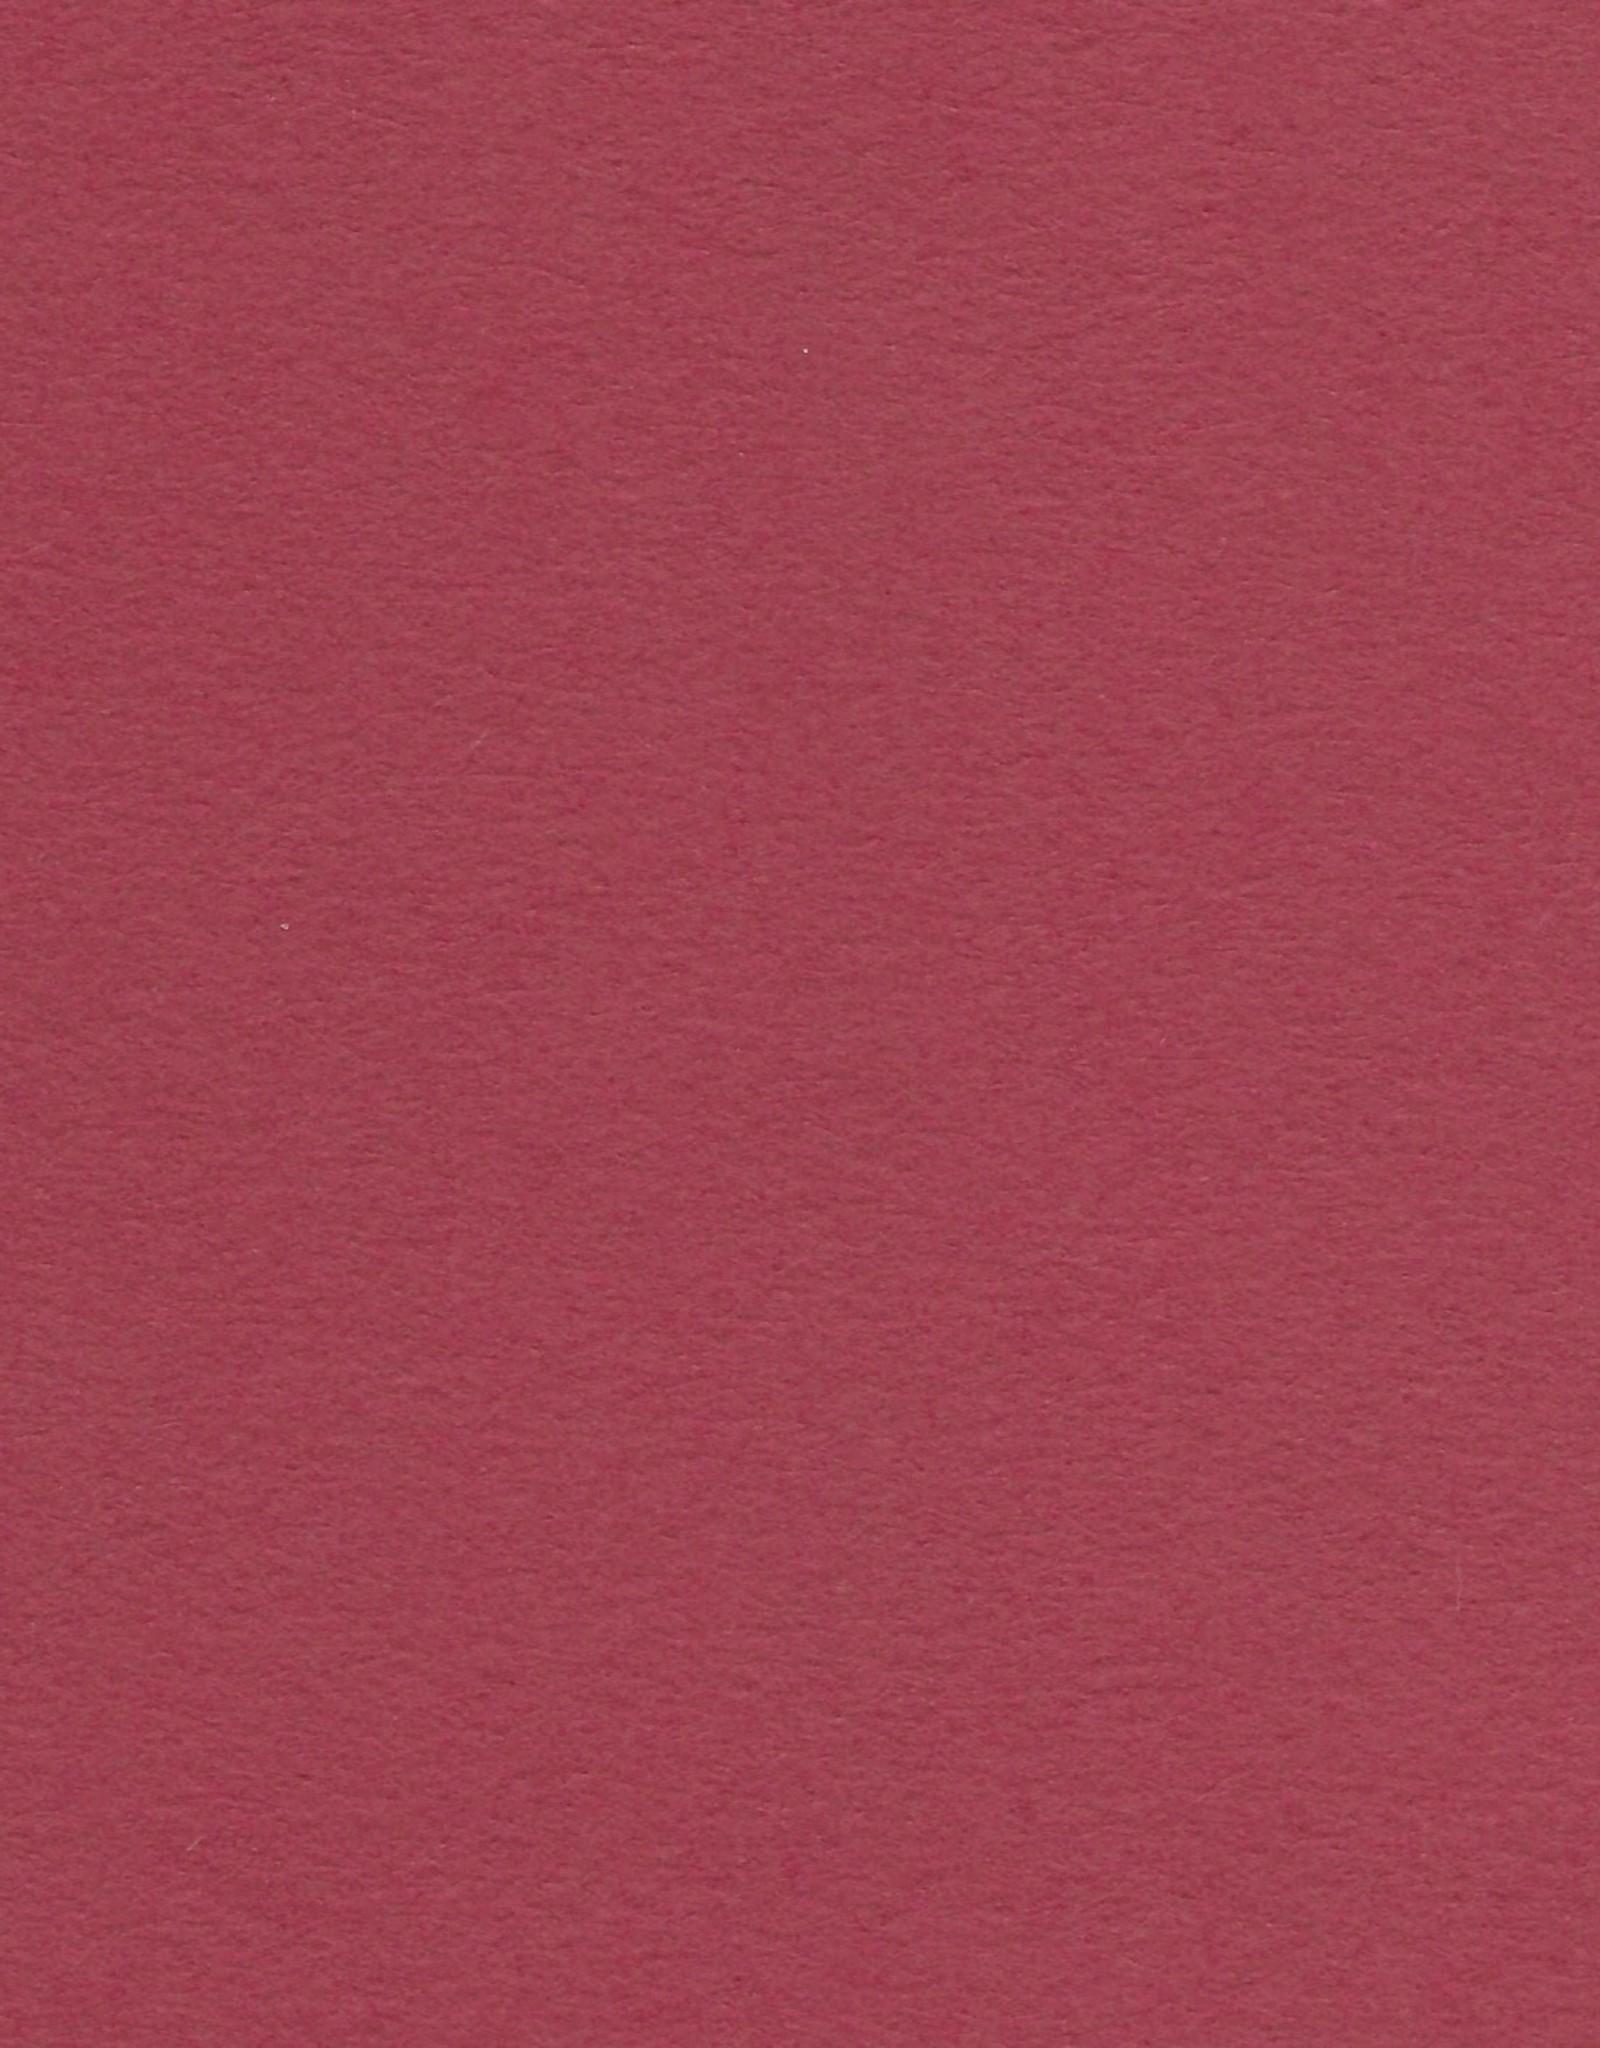 "Colorplan, 91#, Text, Scarlet, 25"" x 38"", 135 gsm"